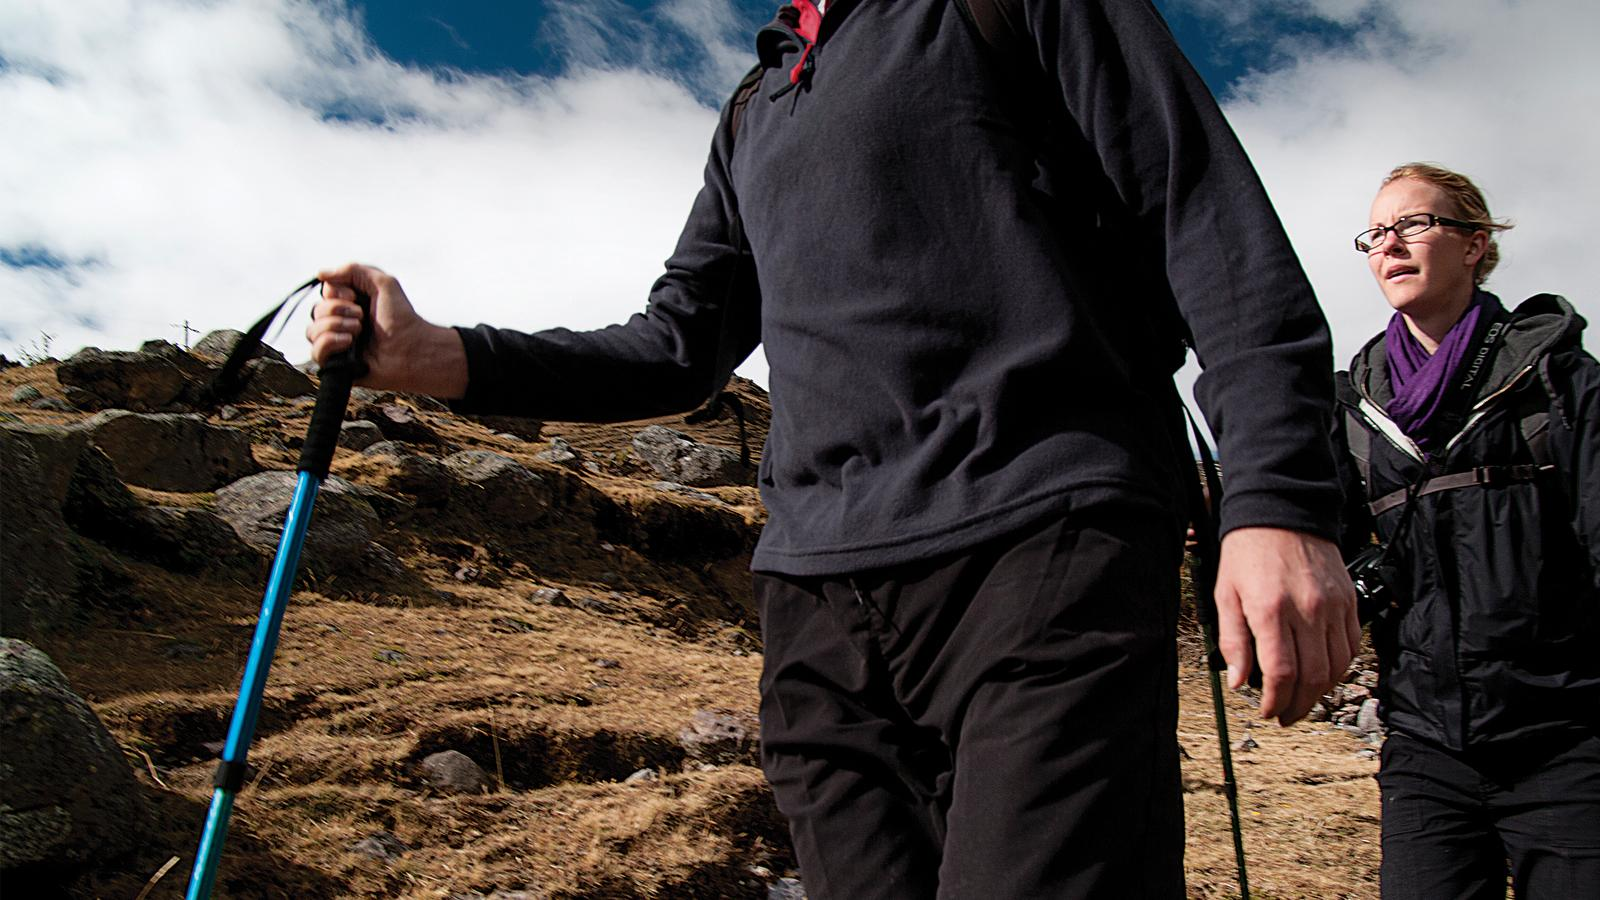 Hiking the Lares Trek to Machu Picchu, Peru